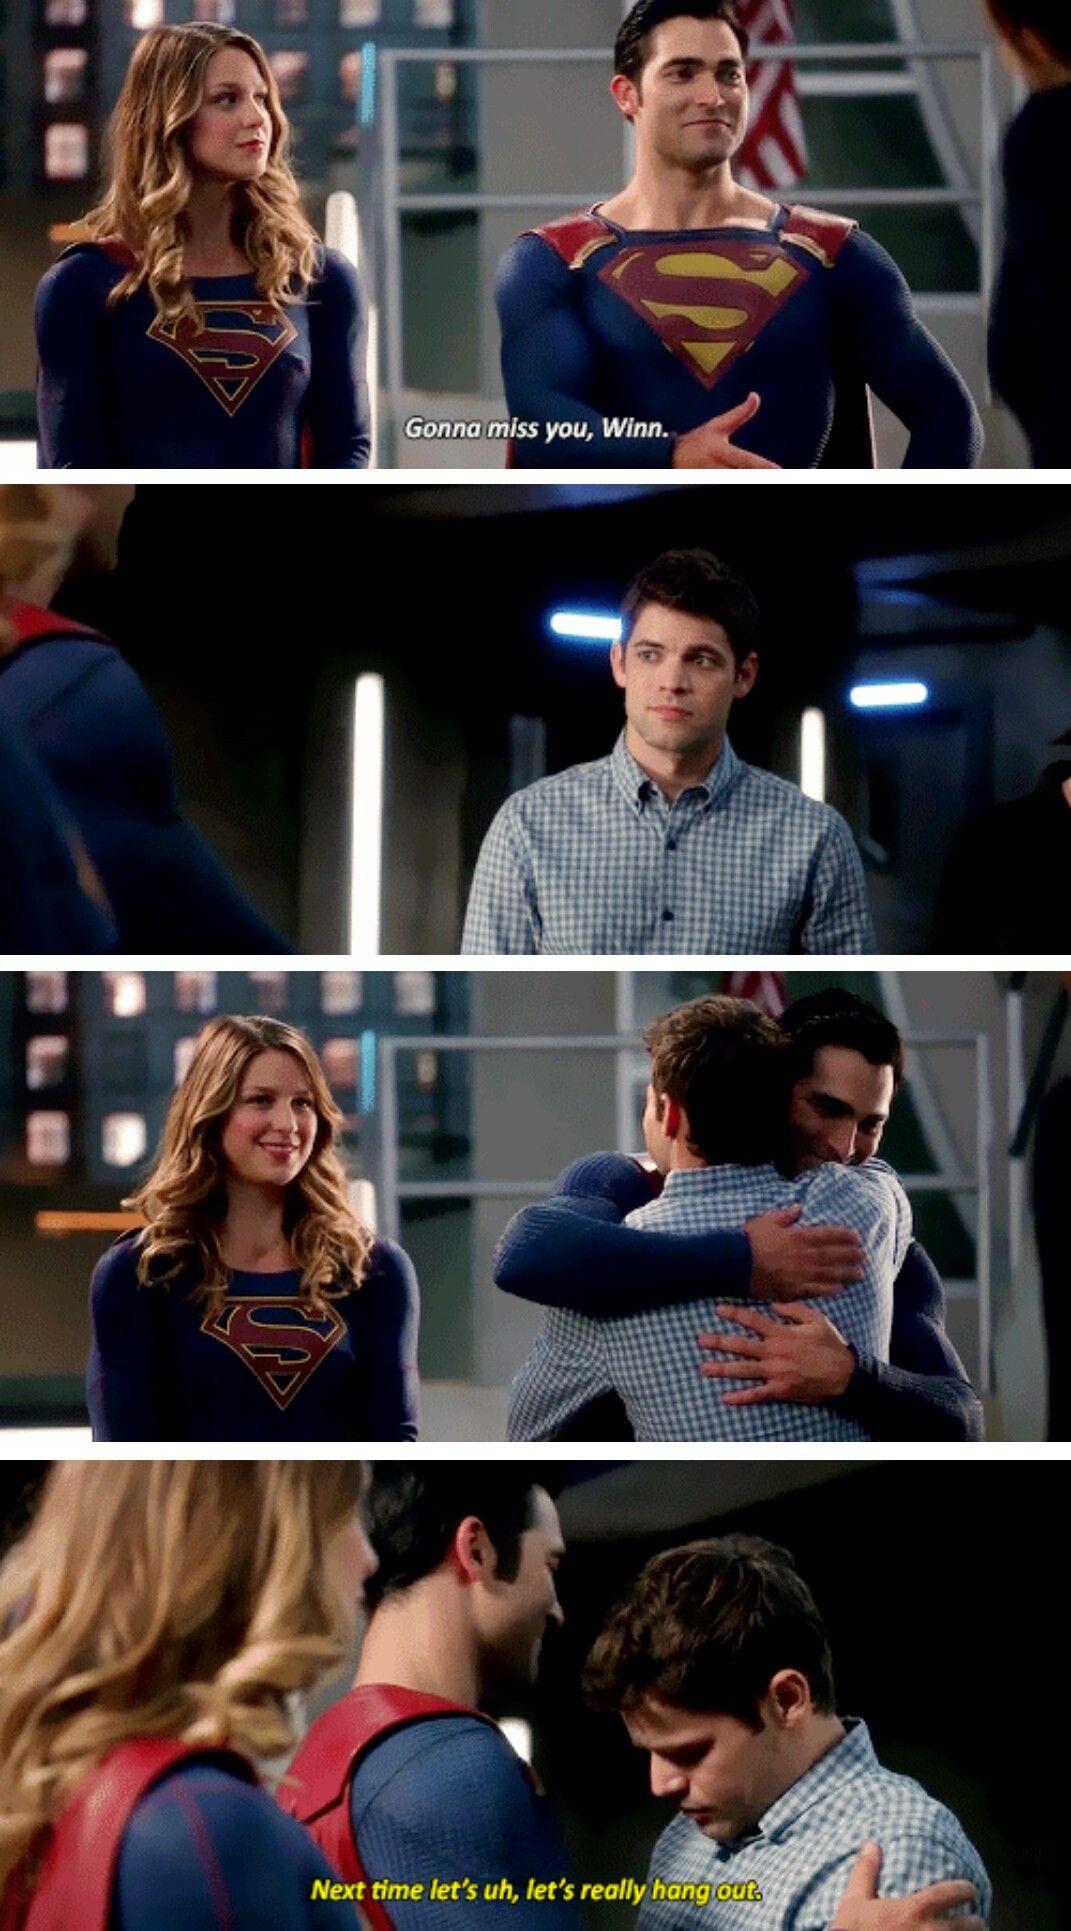 Supergirl, Superman and Winn